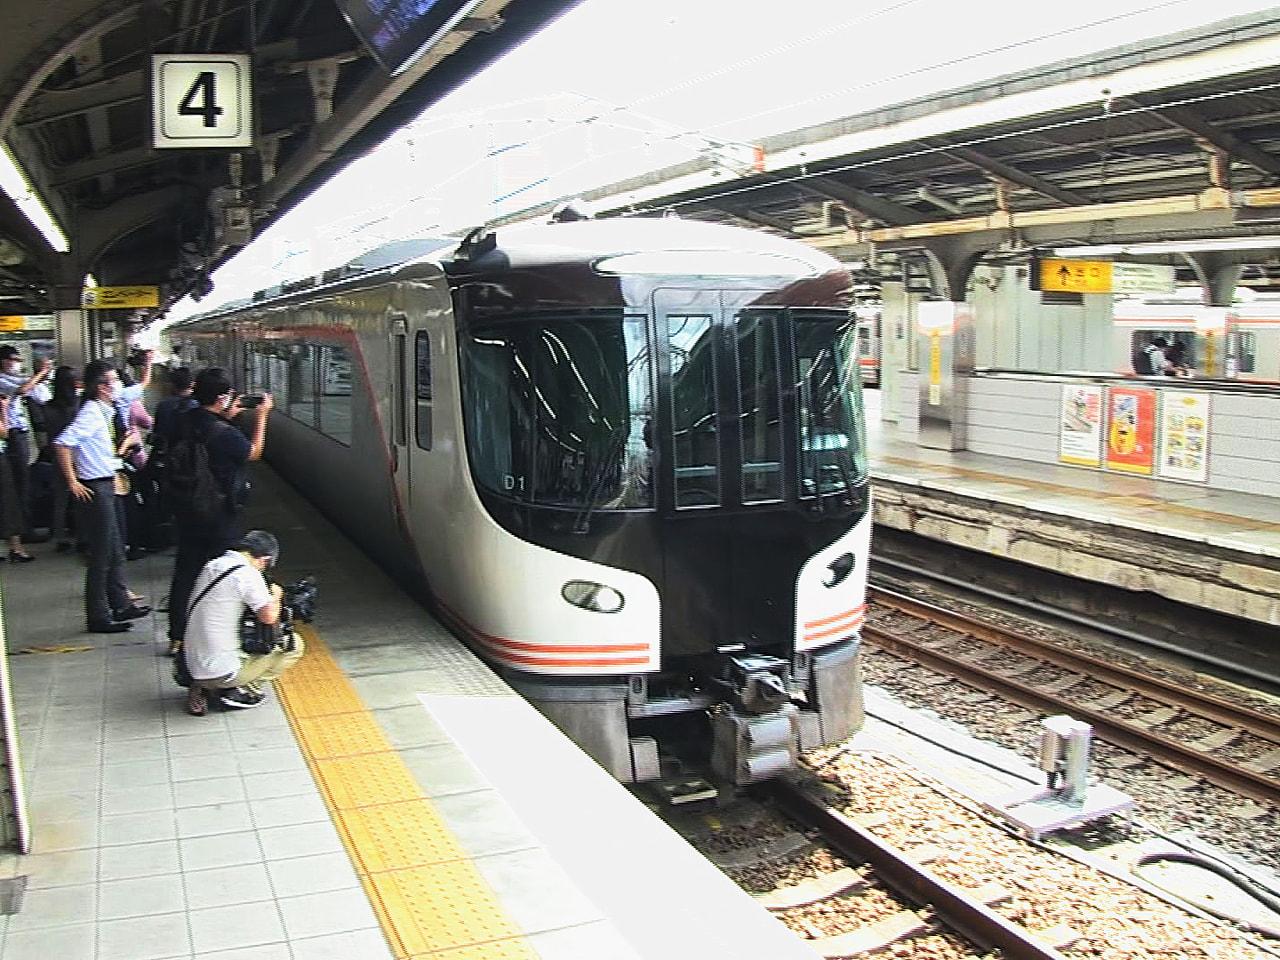 JR東海は24日、2022年度から高山線や紀勢線での営業運転に向けて走行試験を行...